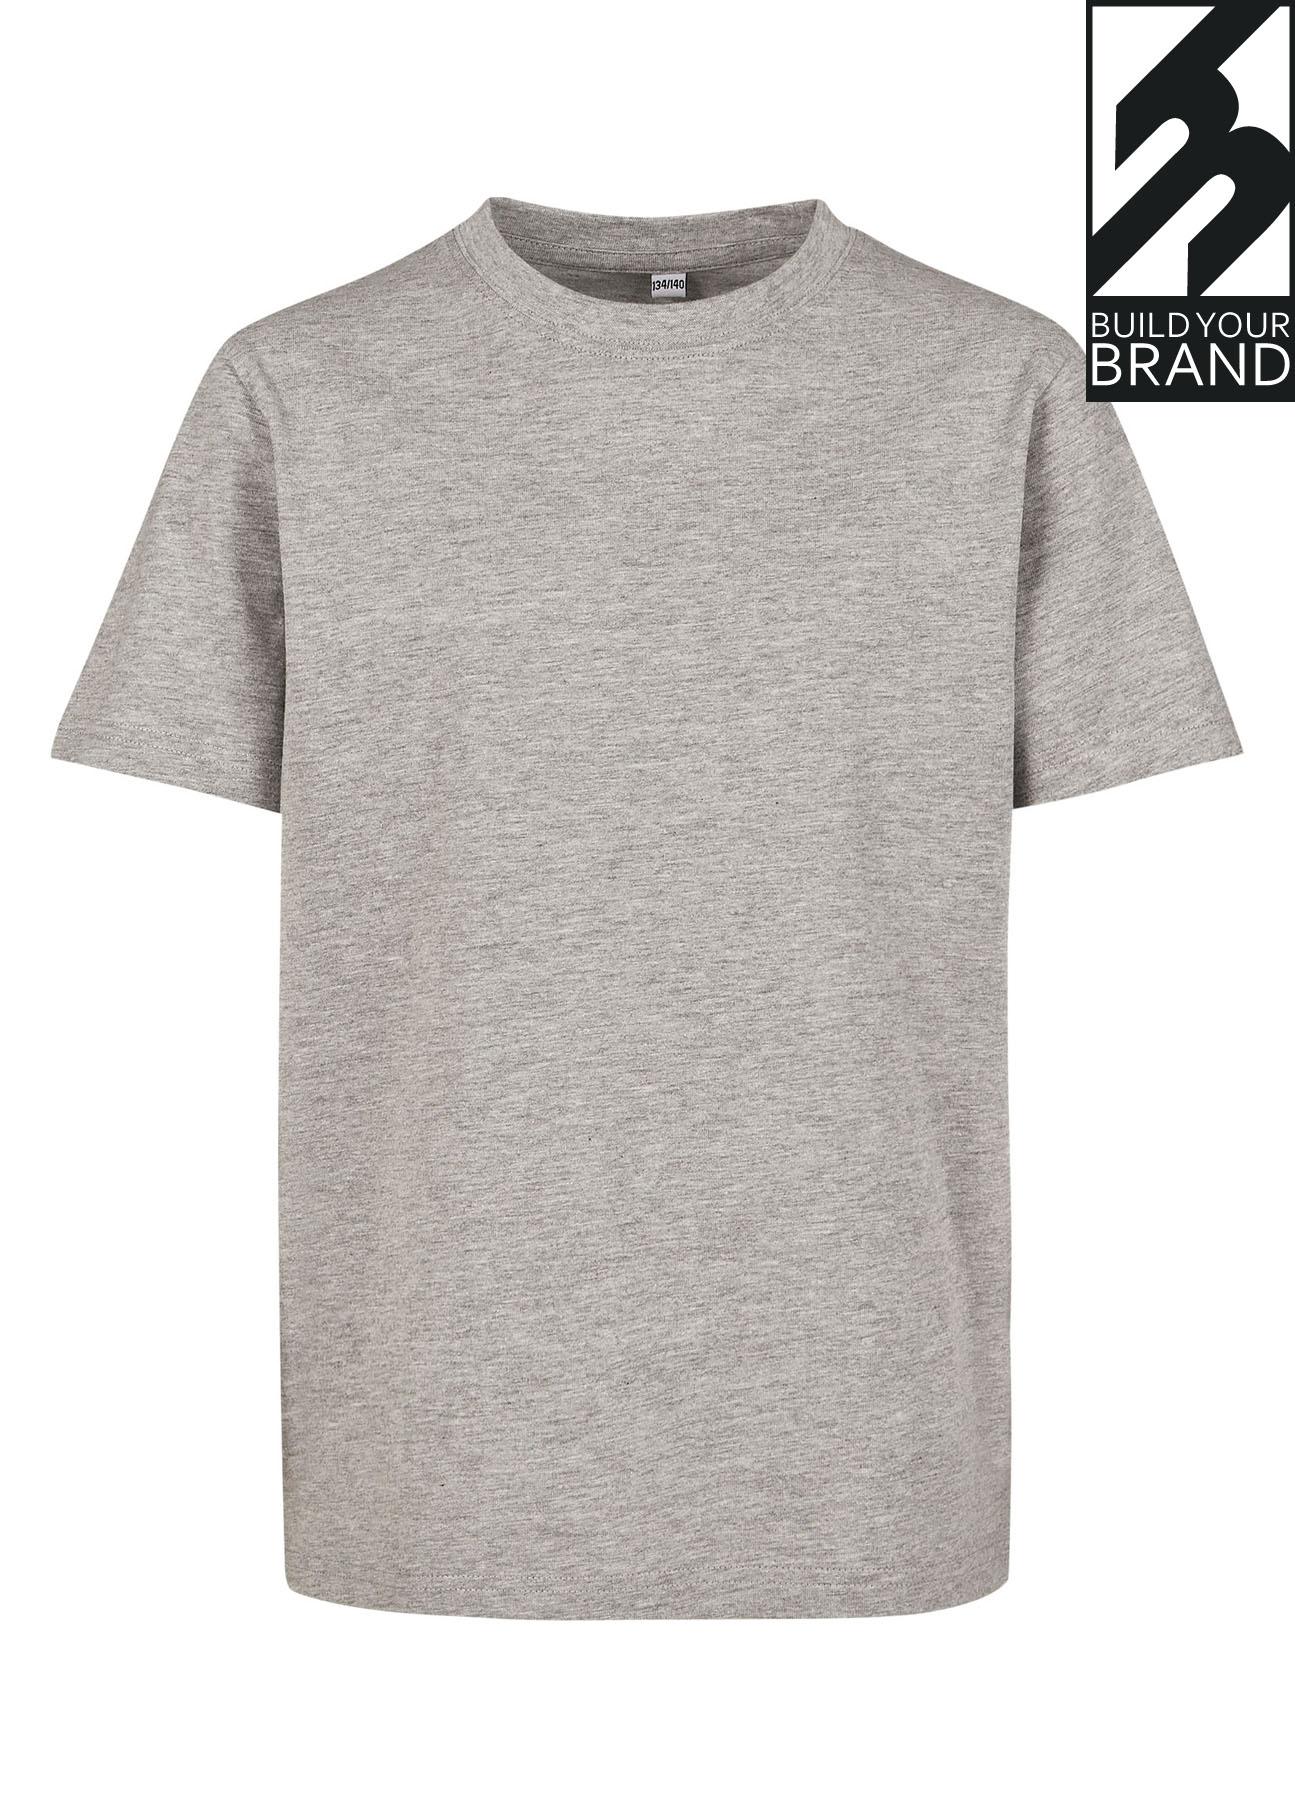 official photos 8c4d8 fb2c3 Build Your Brand, Kinder Basic T-Shirt, günstig bedrucken ...